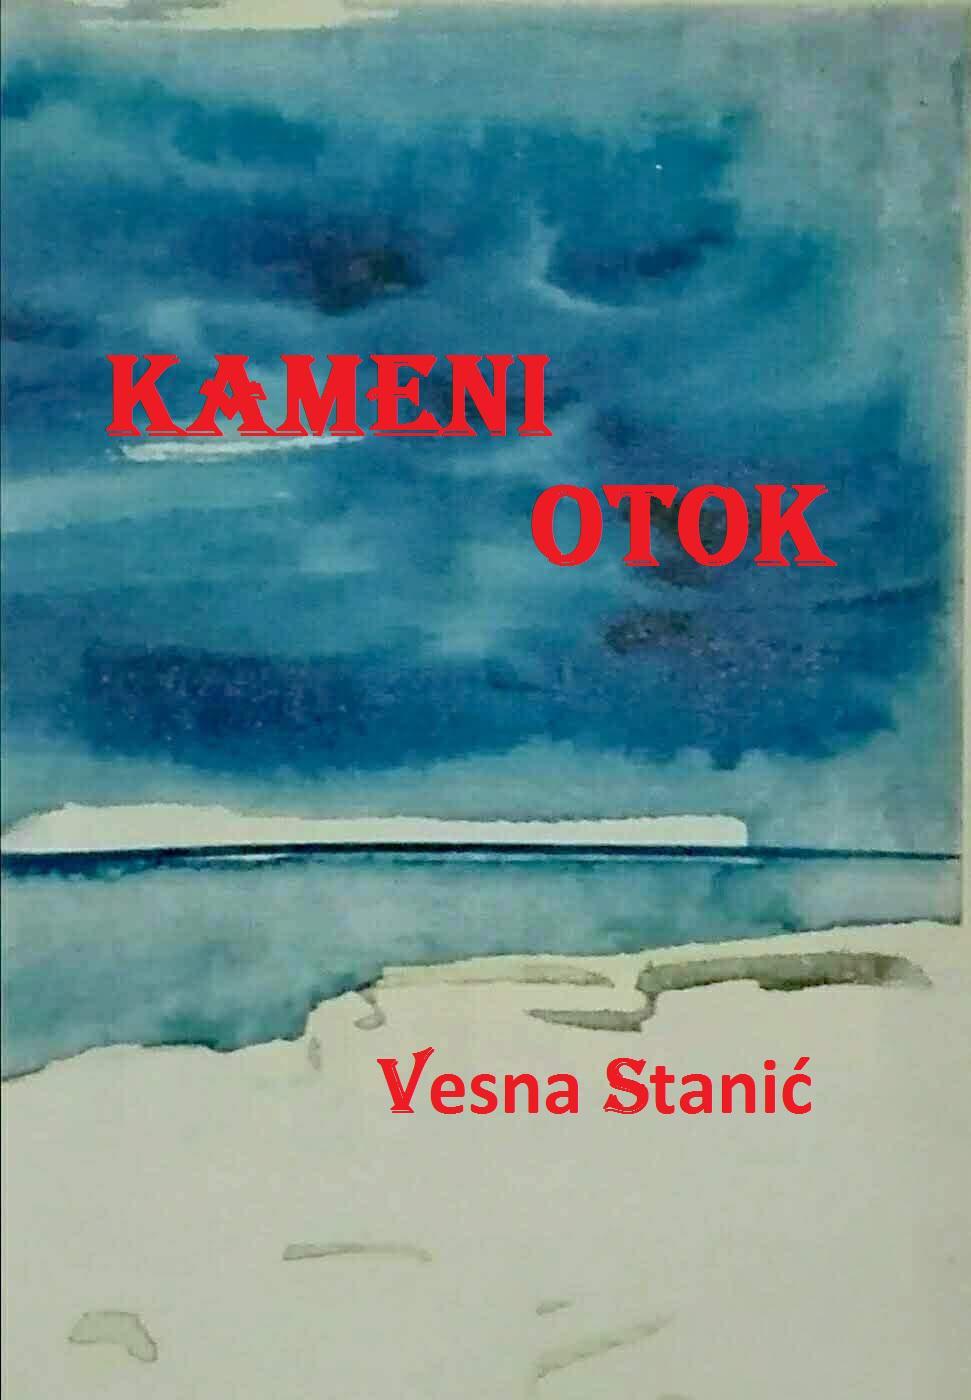 KAMENI OTOK